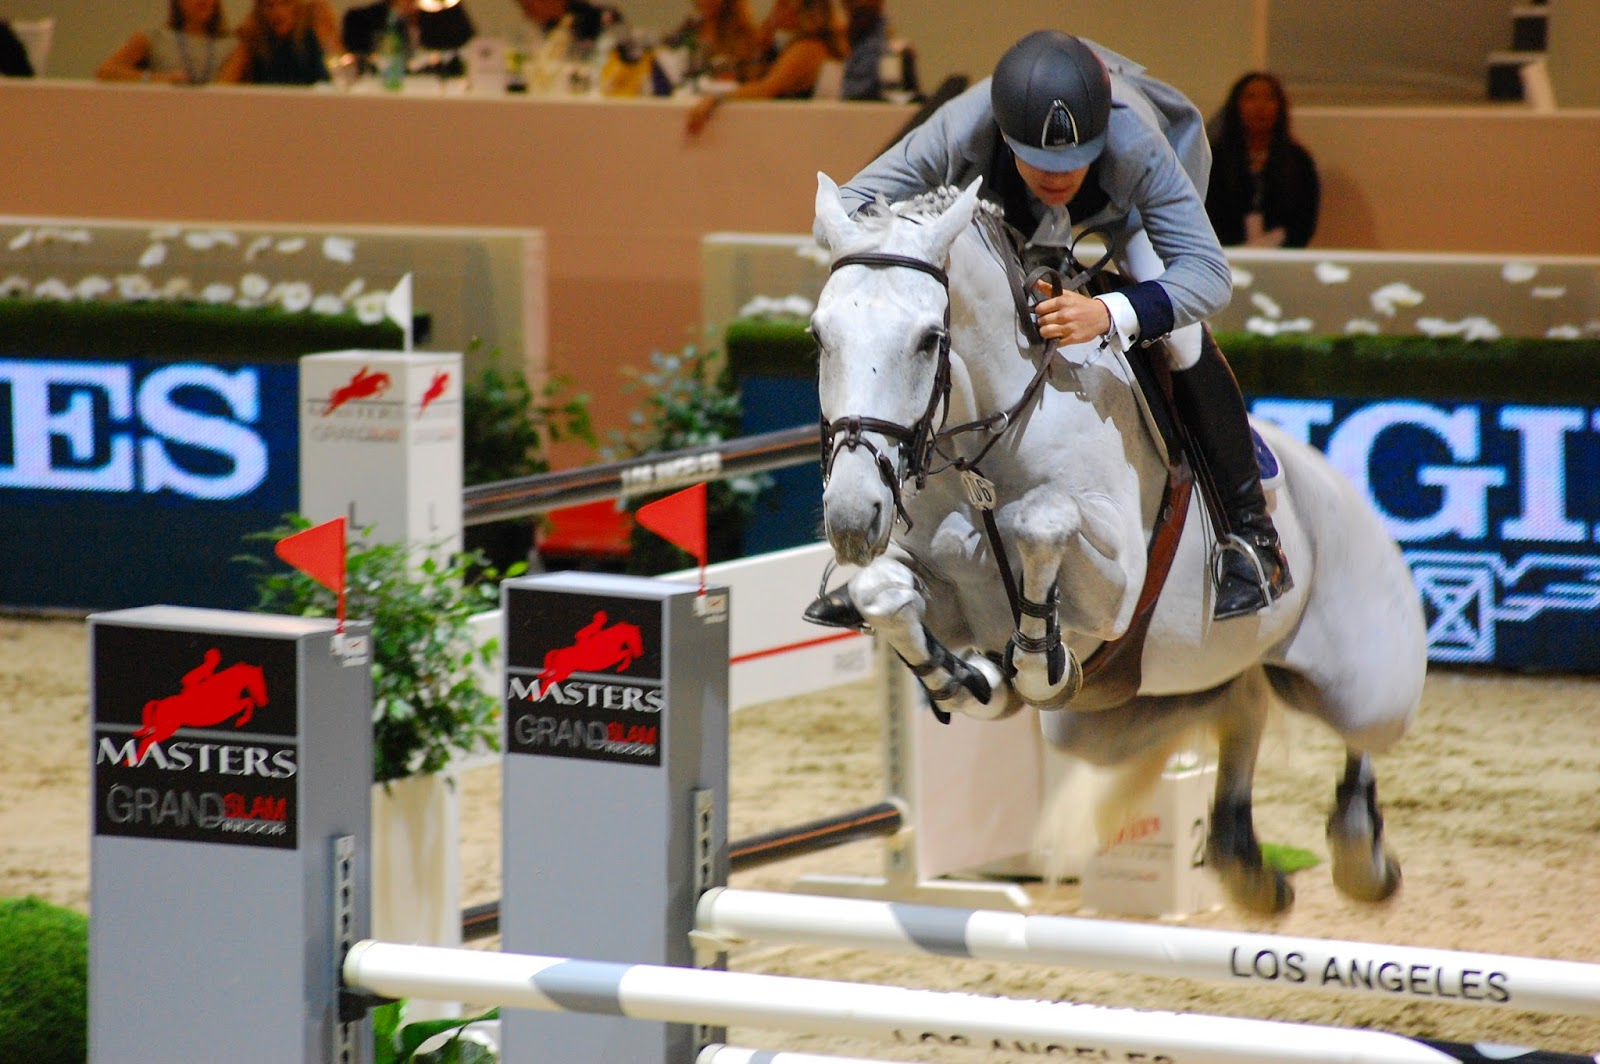 The Modern Equestrian